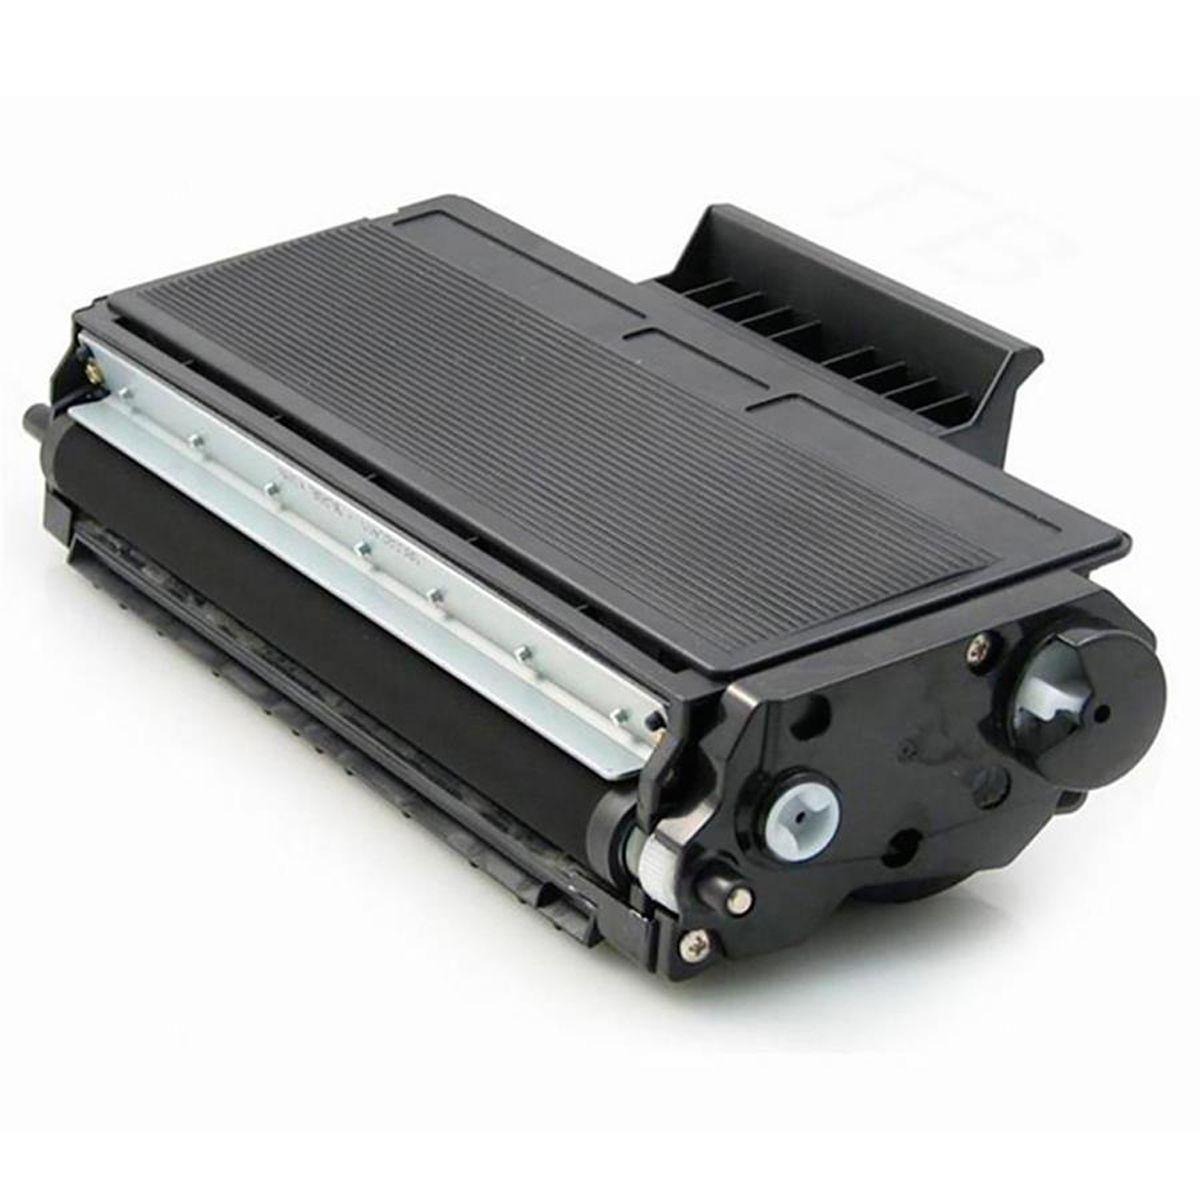 Toner Brother TN650 TN580 - HL5340D HL5370DW HL5380D MFC8480DN DCP8080 DCP8085 - Compatível - 8k